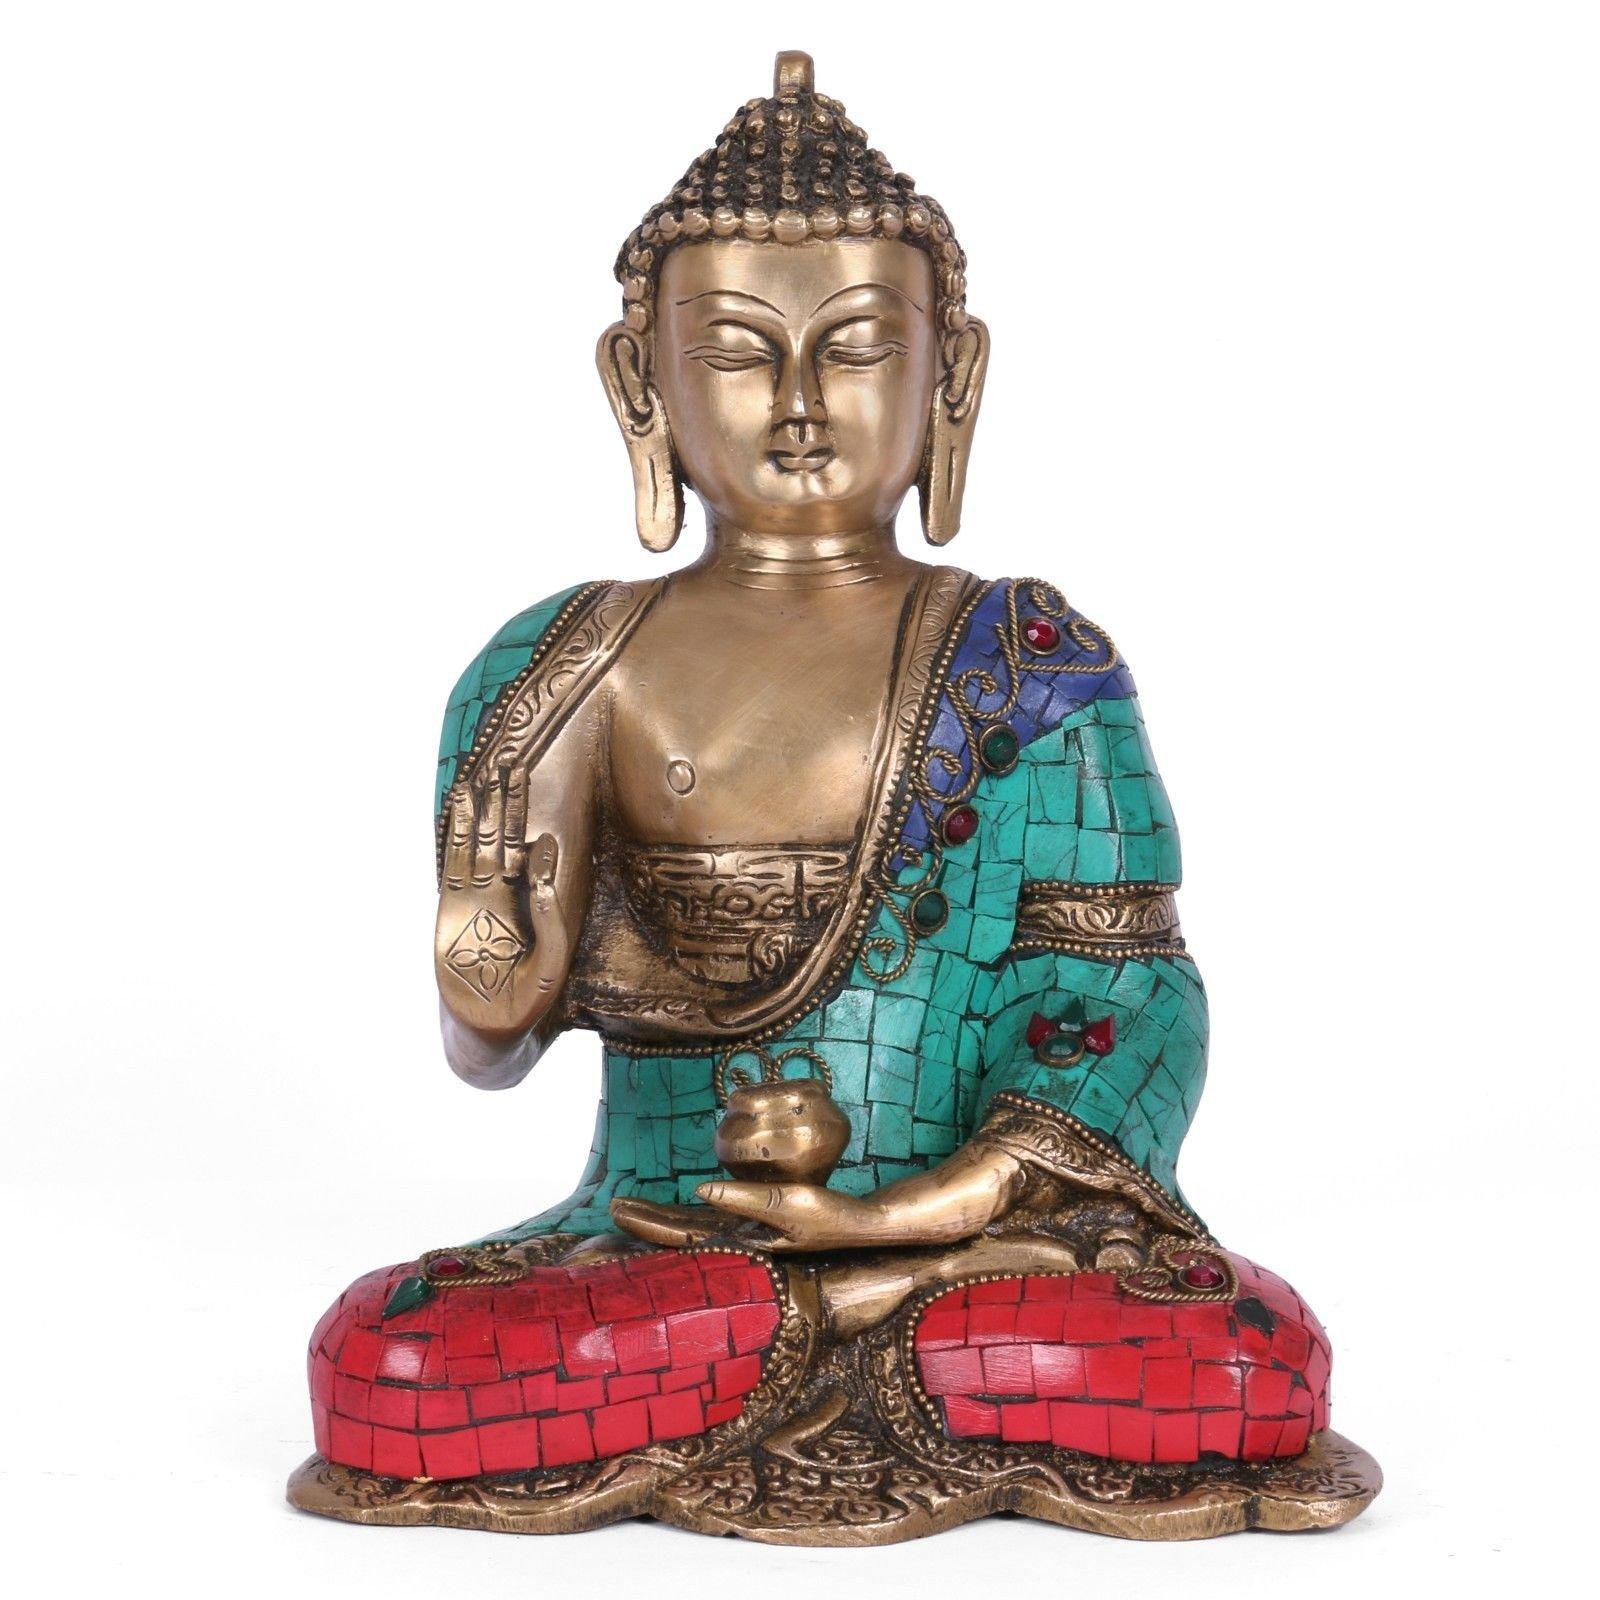 Abhaya Buddha Statue Nepal Turquoise Blessing Brass Buddha Idol India Decor Art